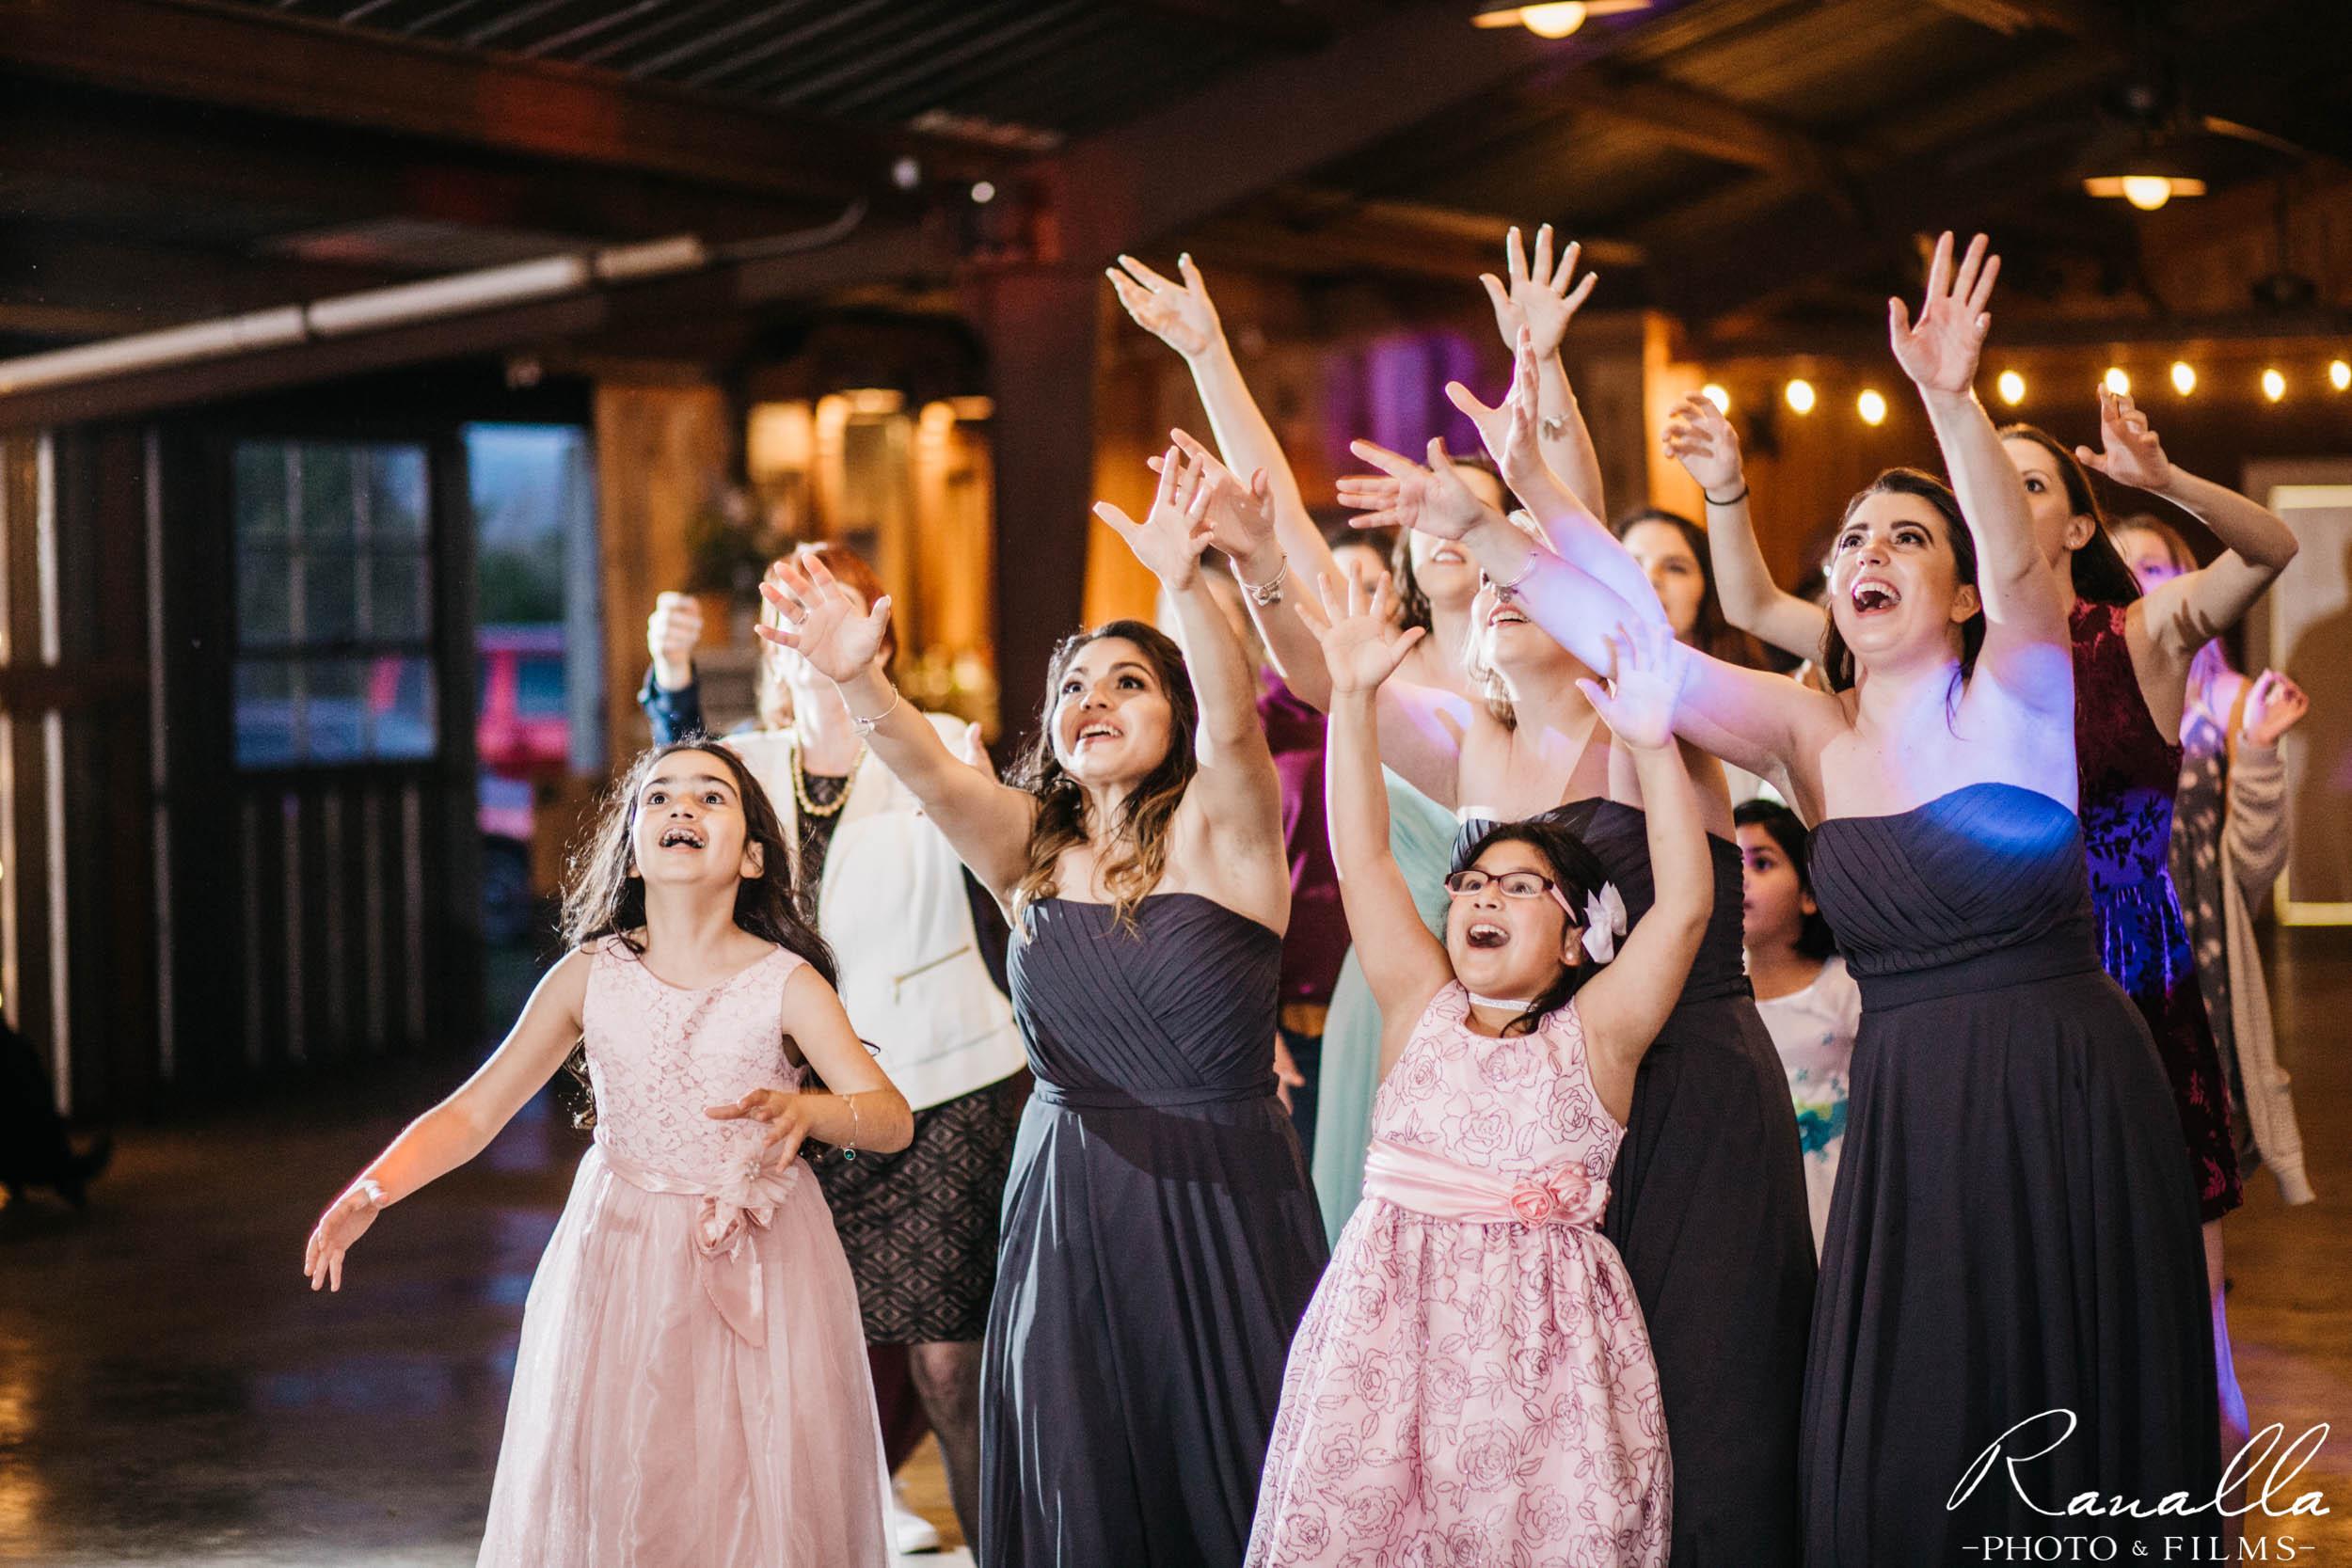 Chico Wedding Photography- Bouquet Toss- Elite Sound- Patrick Ranch Wedding Photos- Ranalla Photo & Films